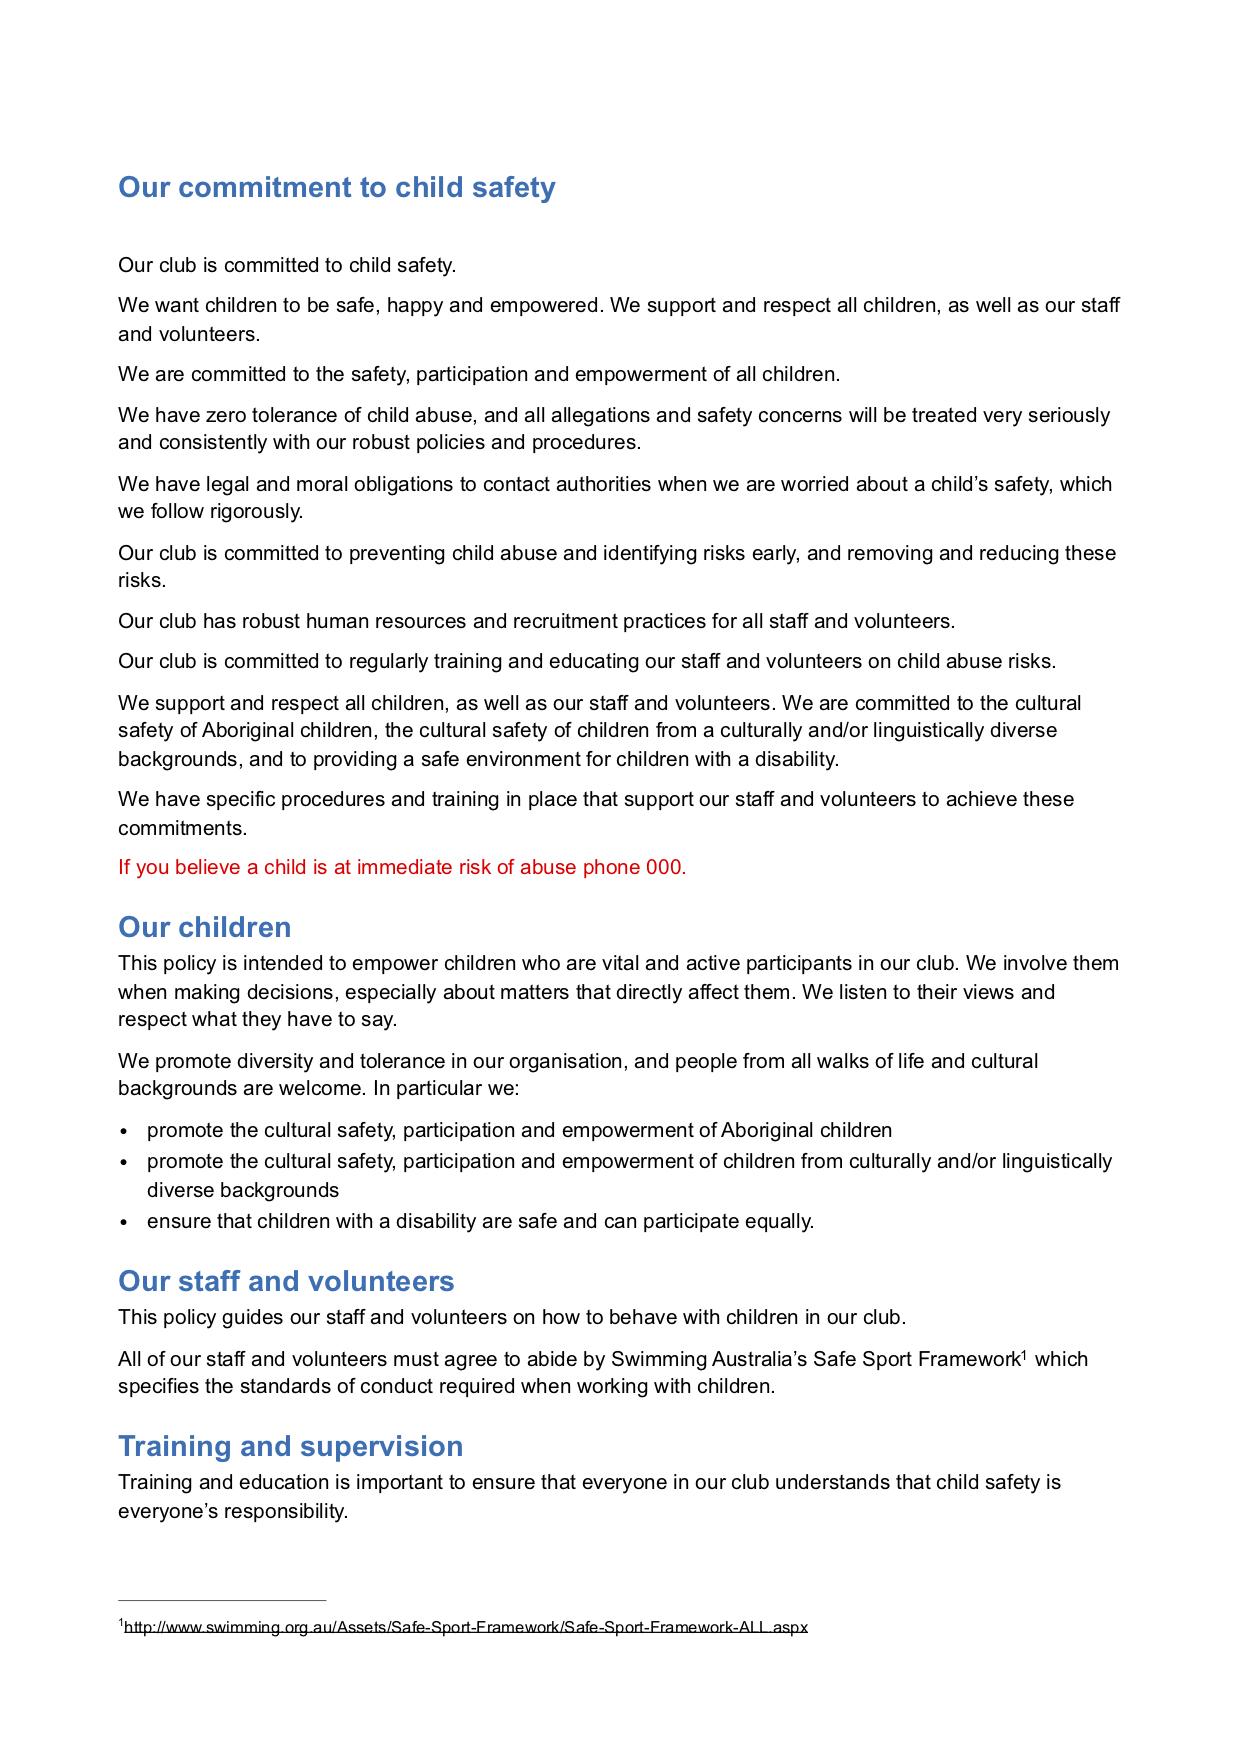 LSC Child Safety Policy 20-11-16 pg2.jpg